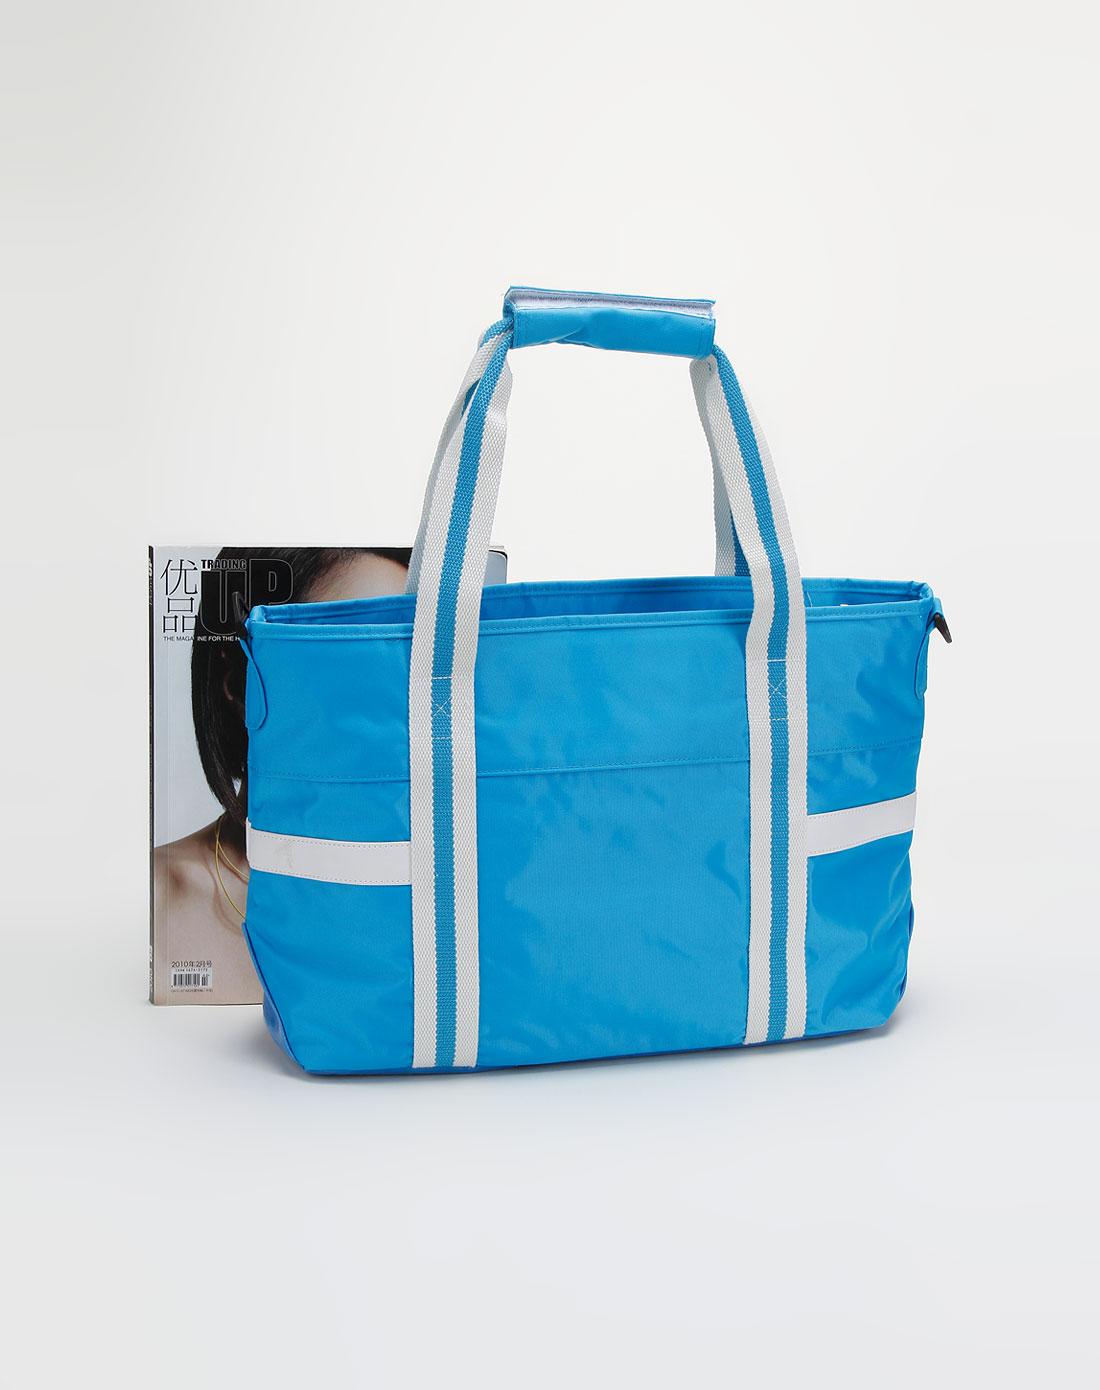 national蓝色时尚休闲手提包